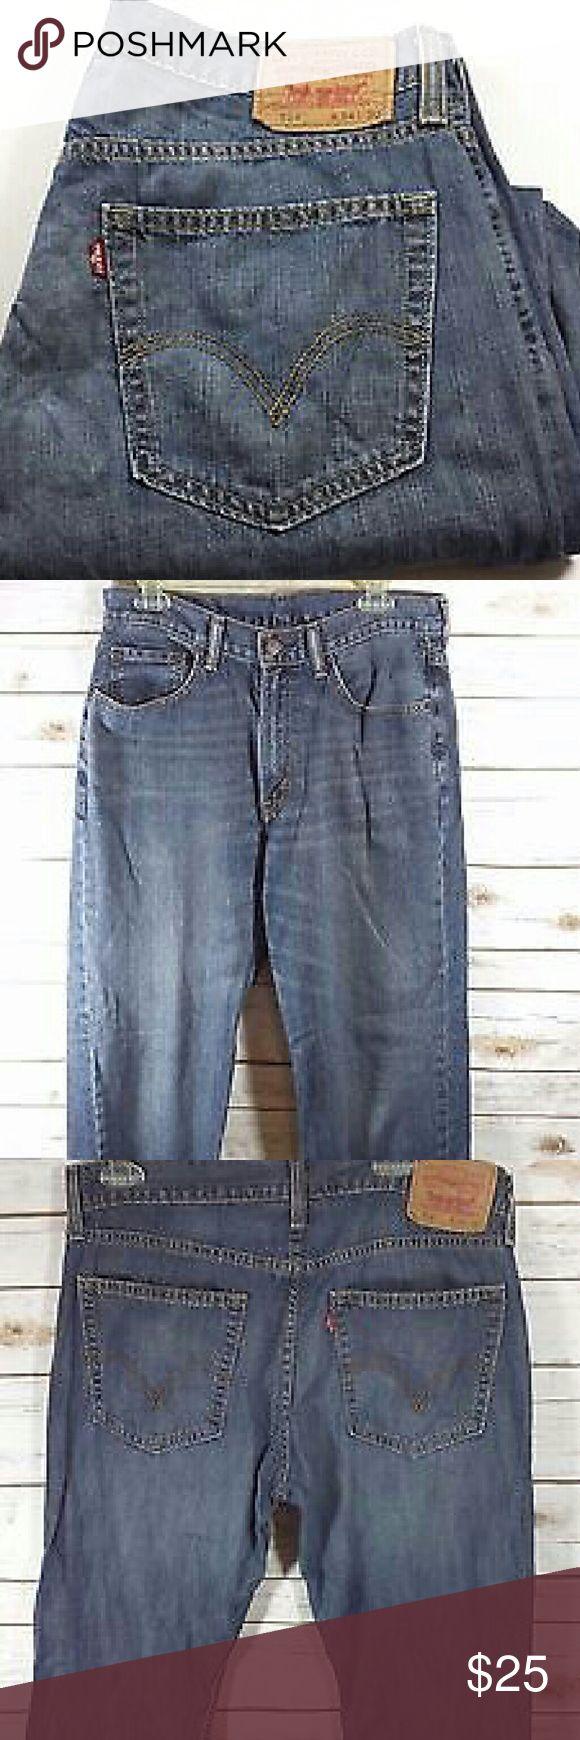 Levi's 514 Slim Straight Fit Jeans Size 34x30 Levis 514 Slim Straight Fit Jeans Size: 34x30 100% Cotton Levi's Jeans Slim Straight